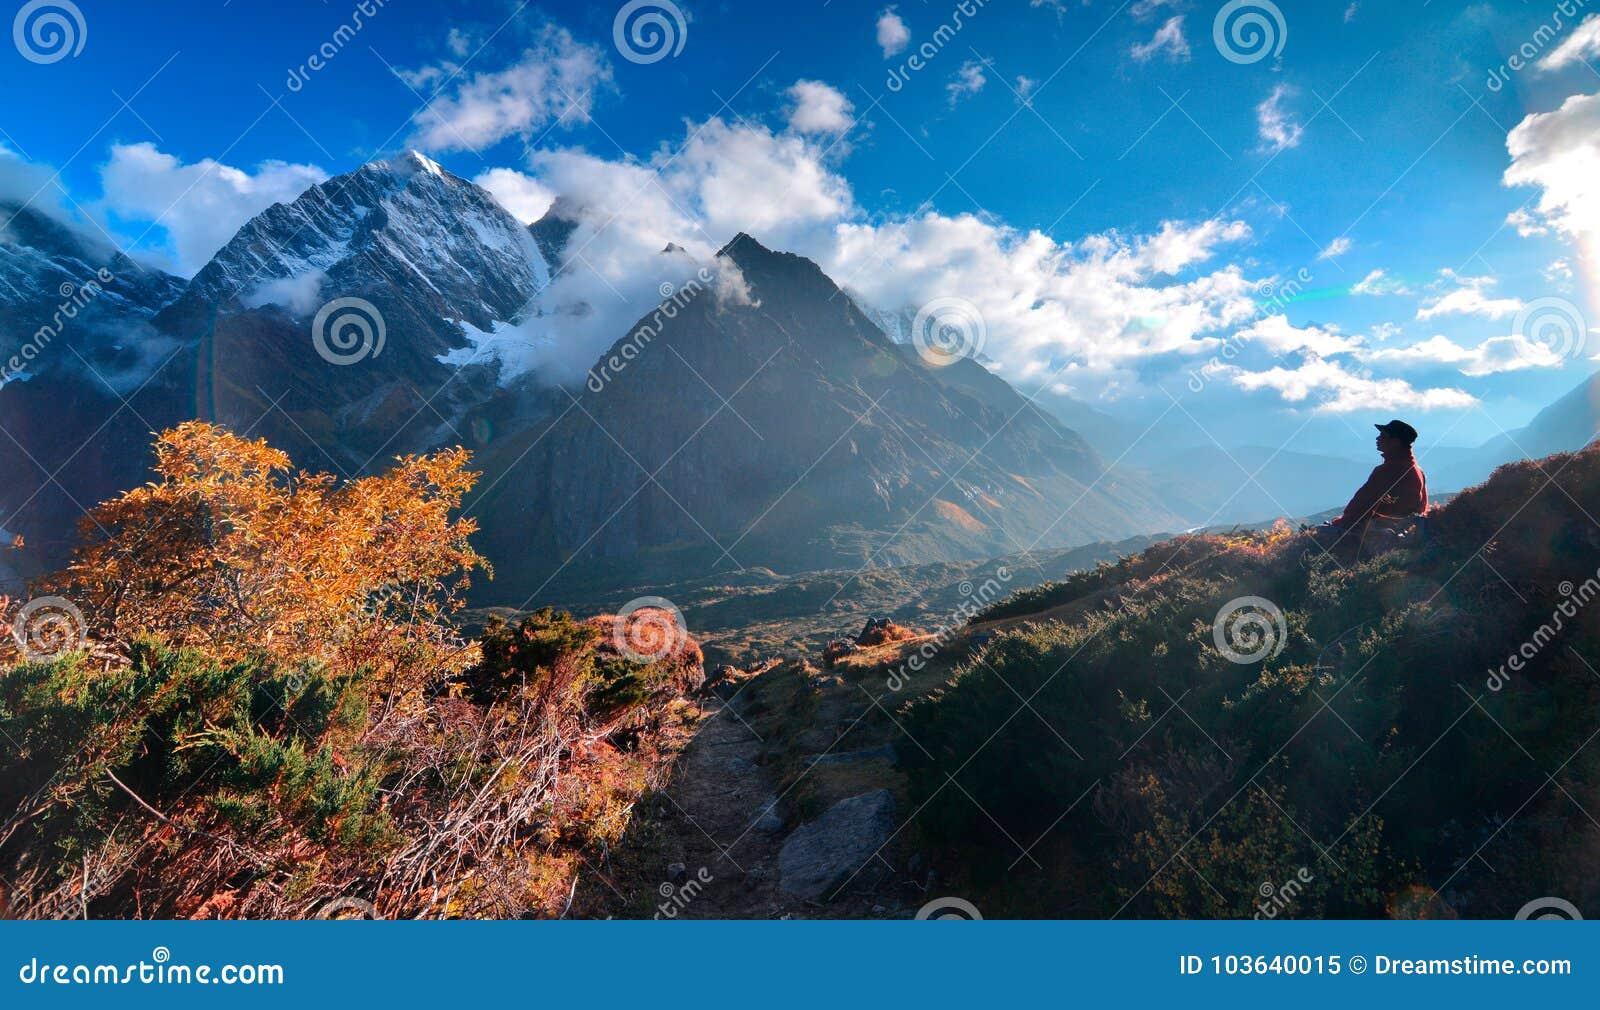 Everest east slope scenery